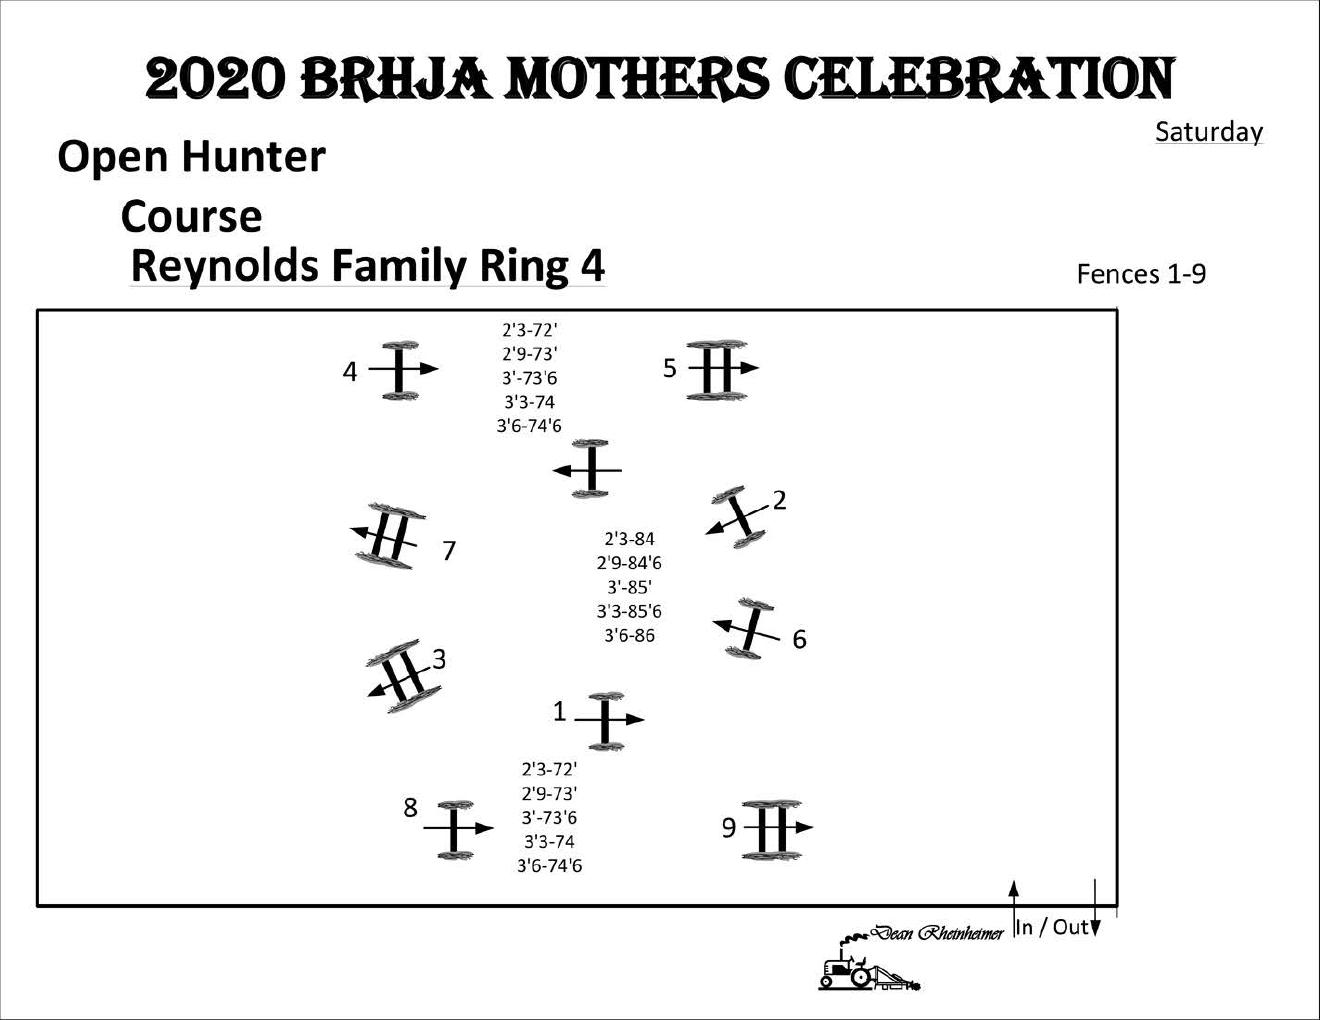 SingleOxer.com BRHJA Mothers Celebration Saturday 5-30 Ring4 Open Hunter